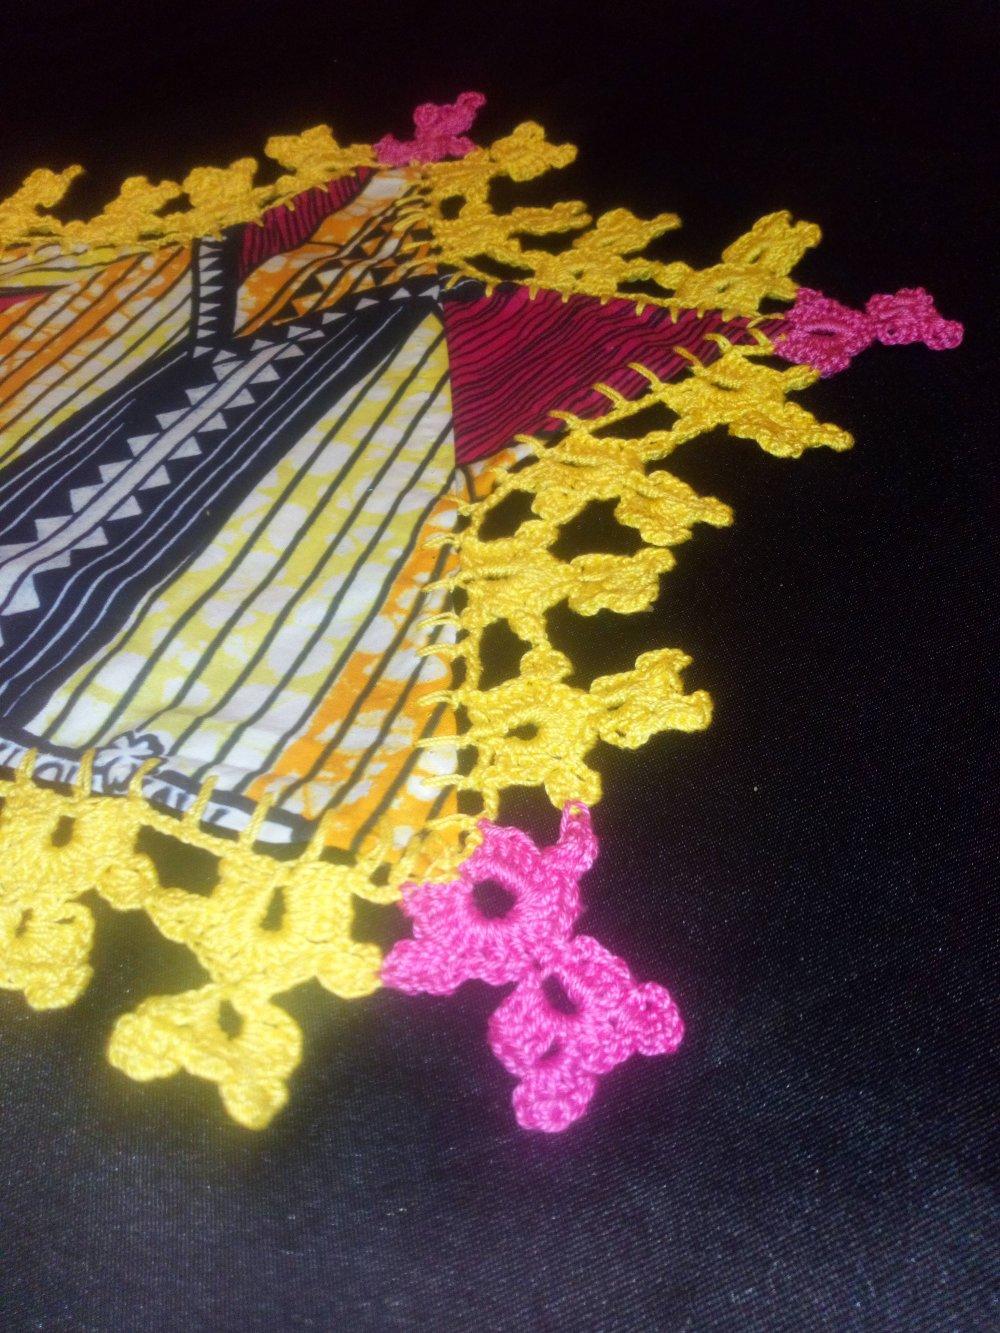 Napperon Etoile en tissus africain Wax et crochet.